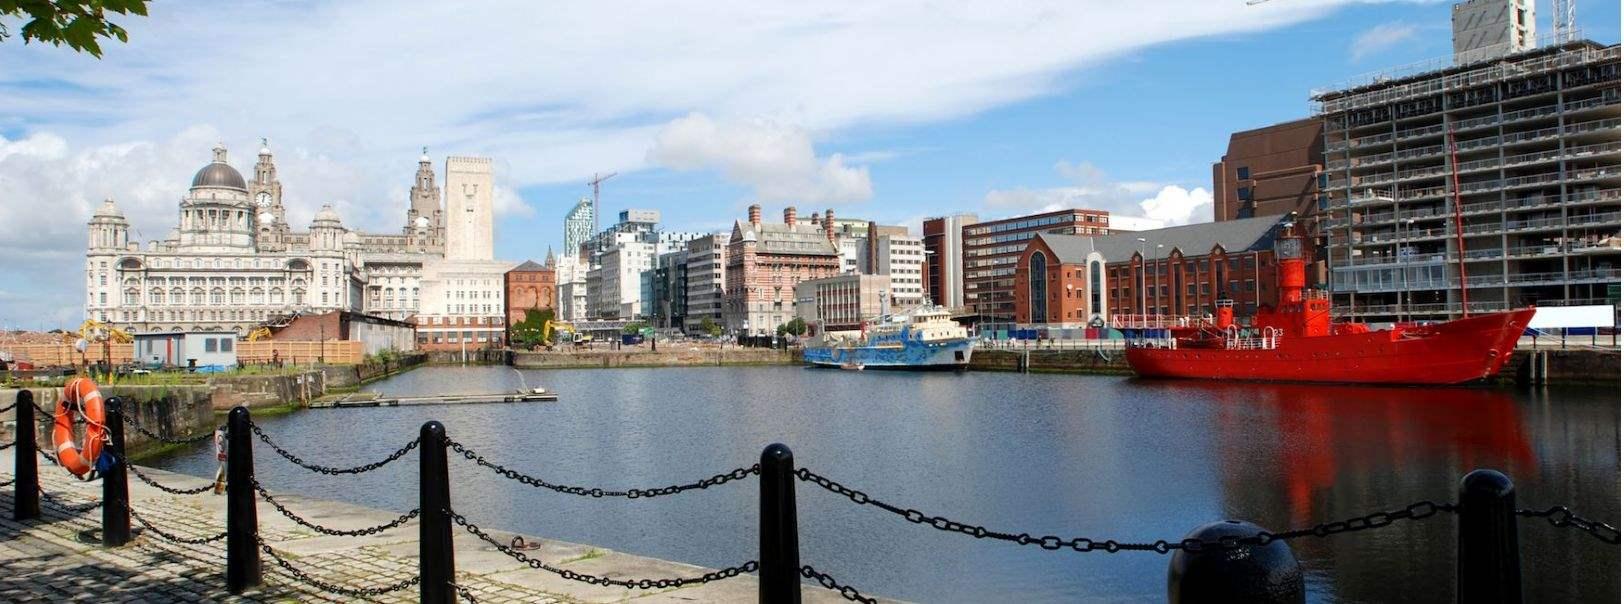 Albert Dock and Liver Building, Liverpool